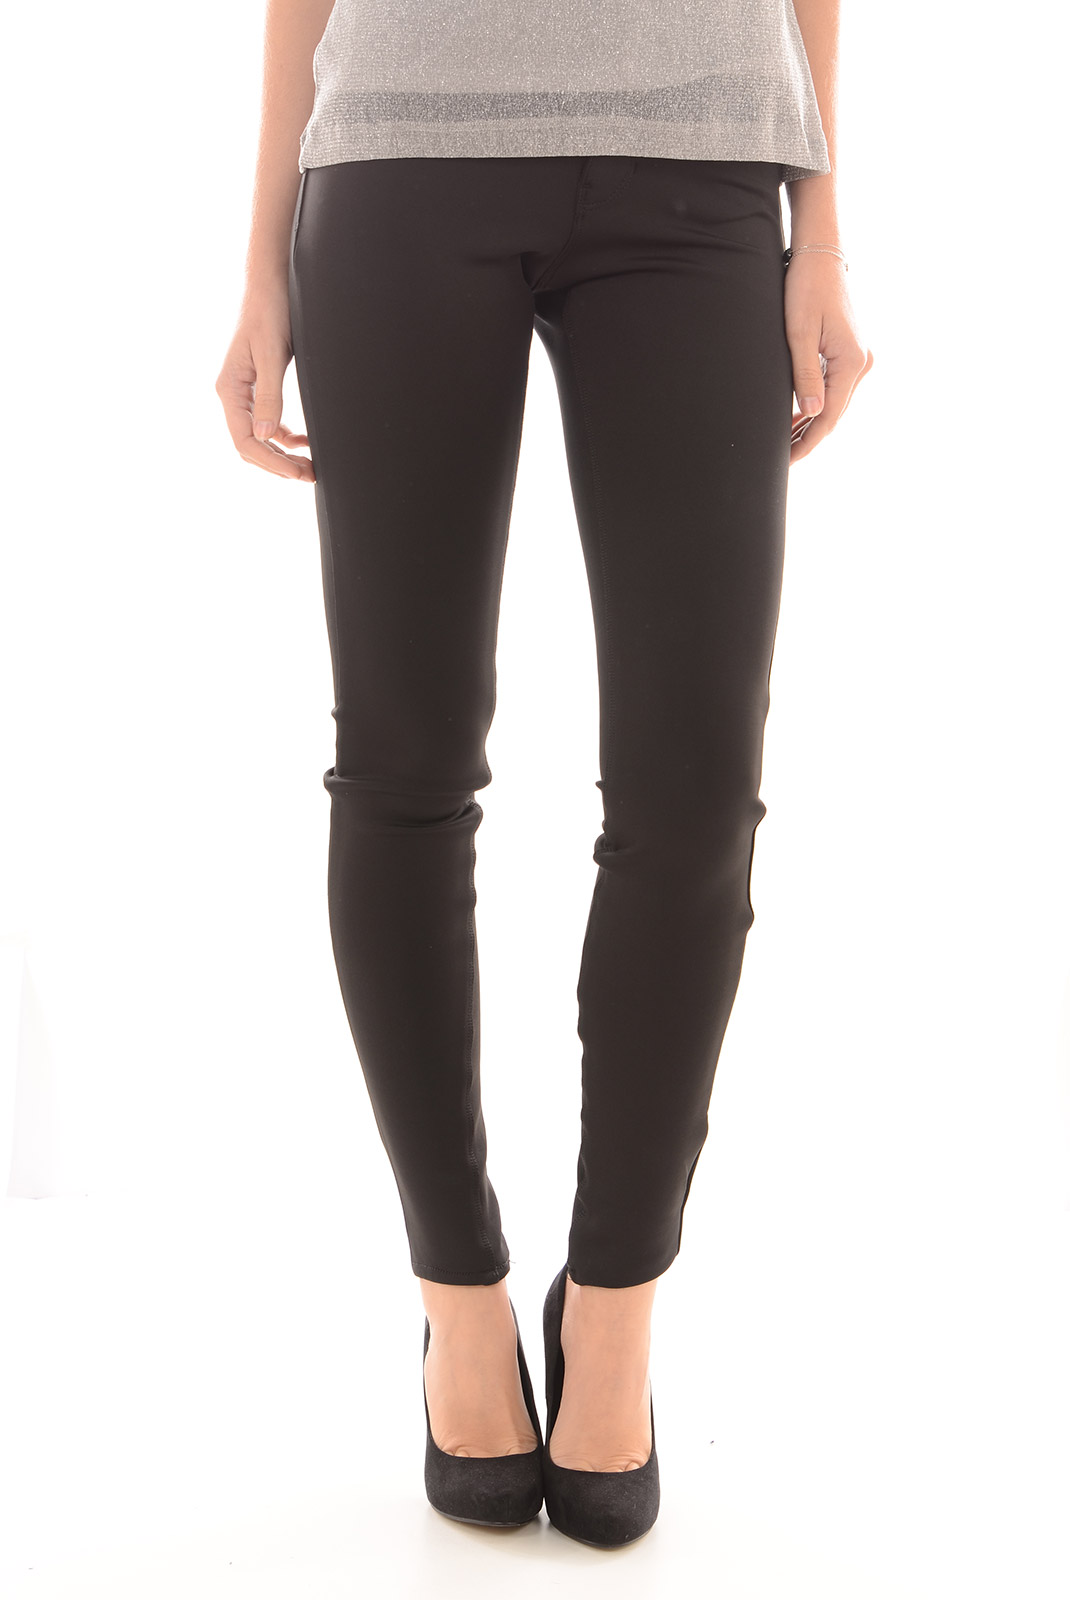 Pantalons  Vero moda SEVEN NW SUPER SLIM SCUBA BLACK